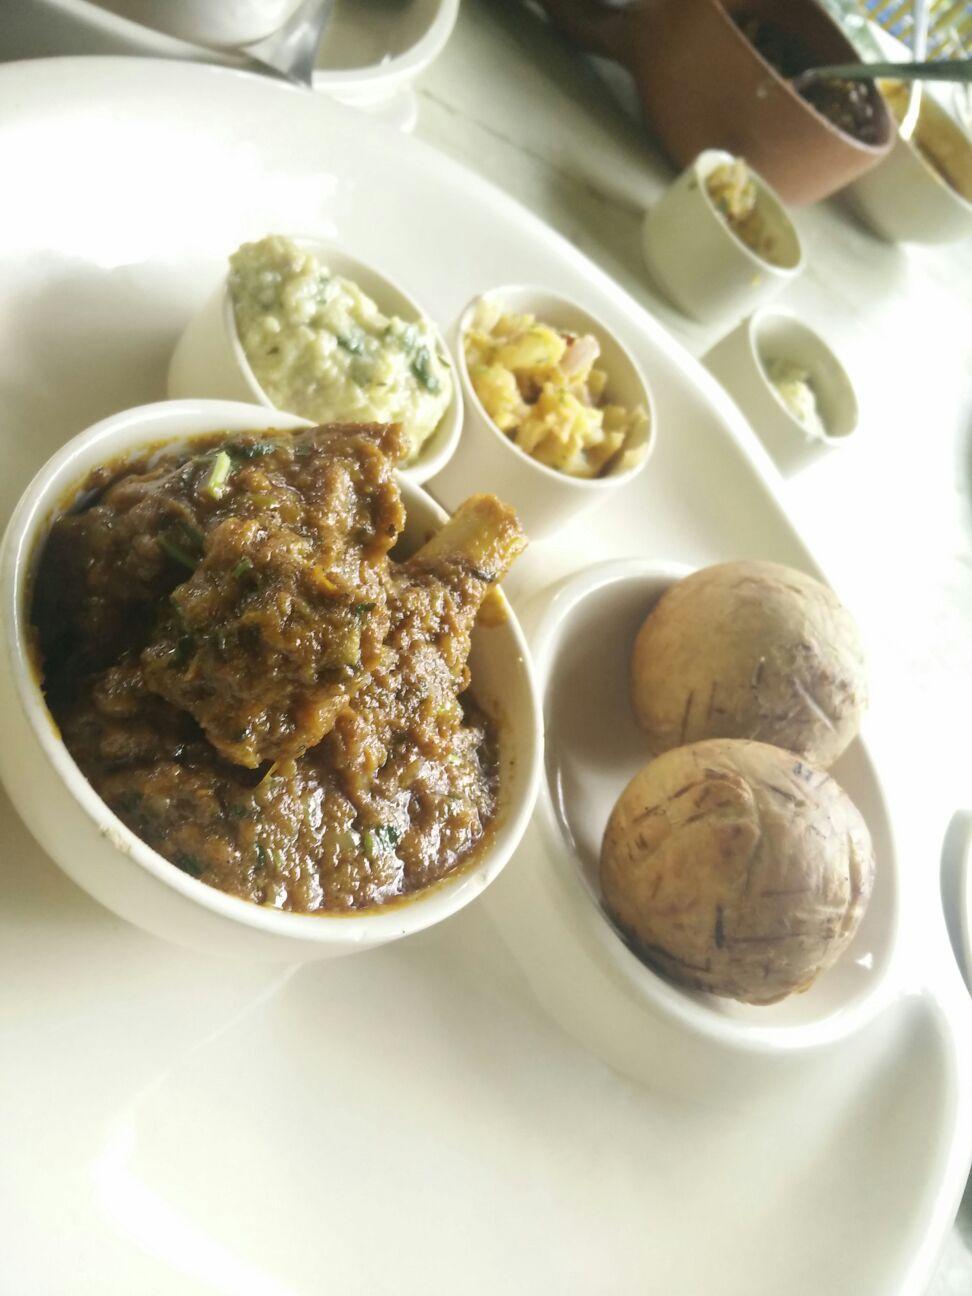 bihari cuisine in delhi